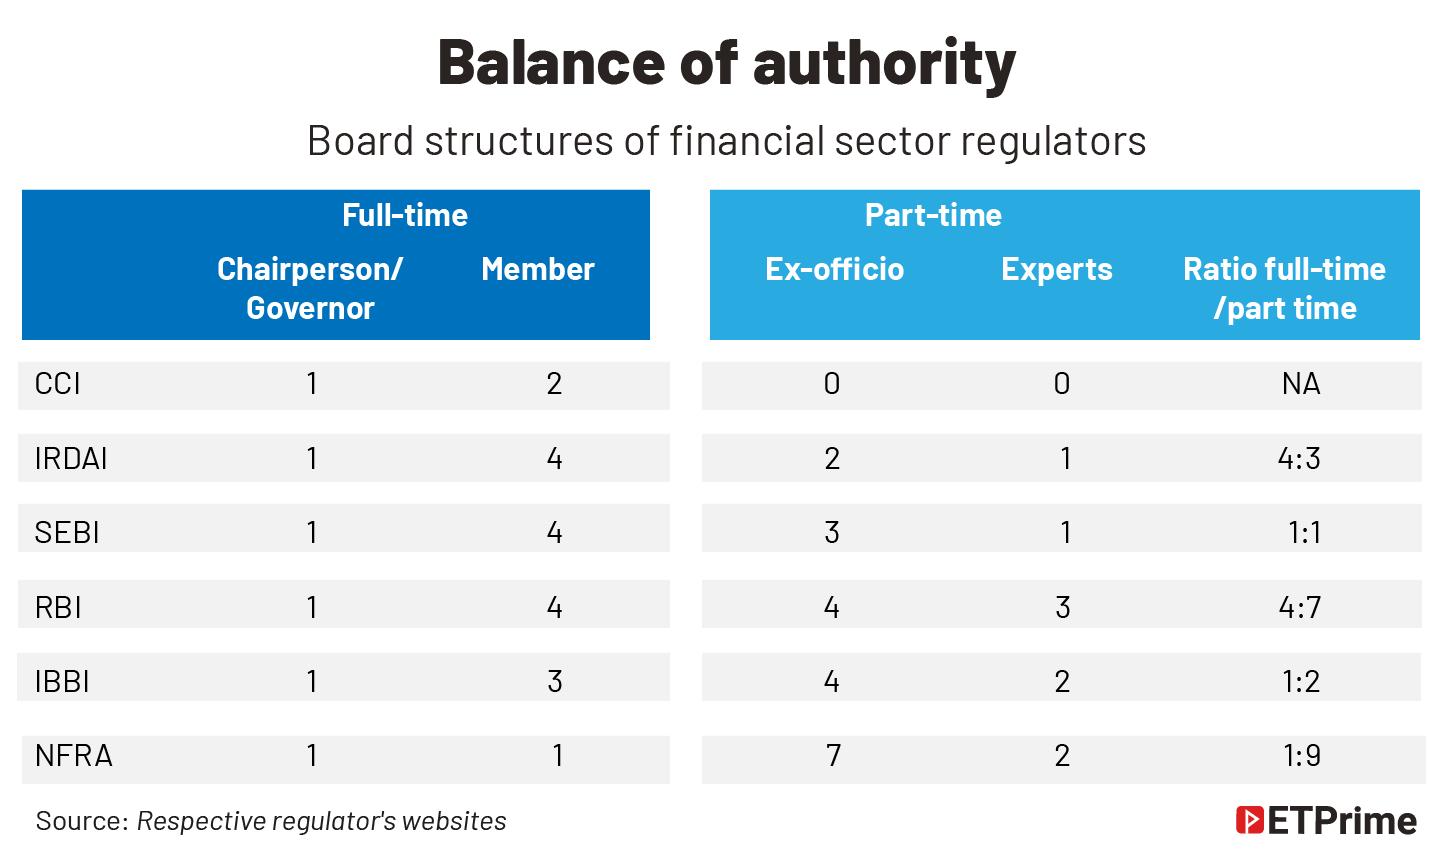 Balance of authority@2x